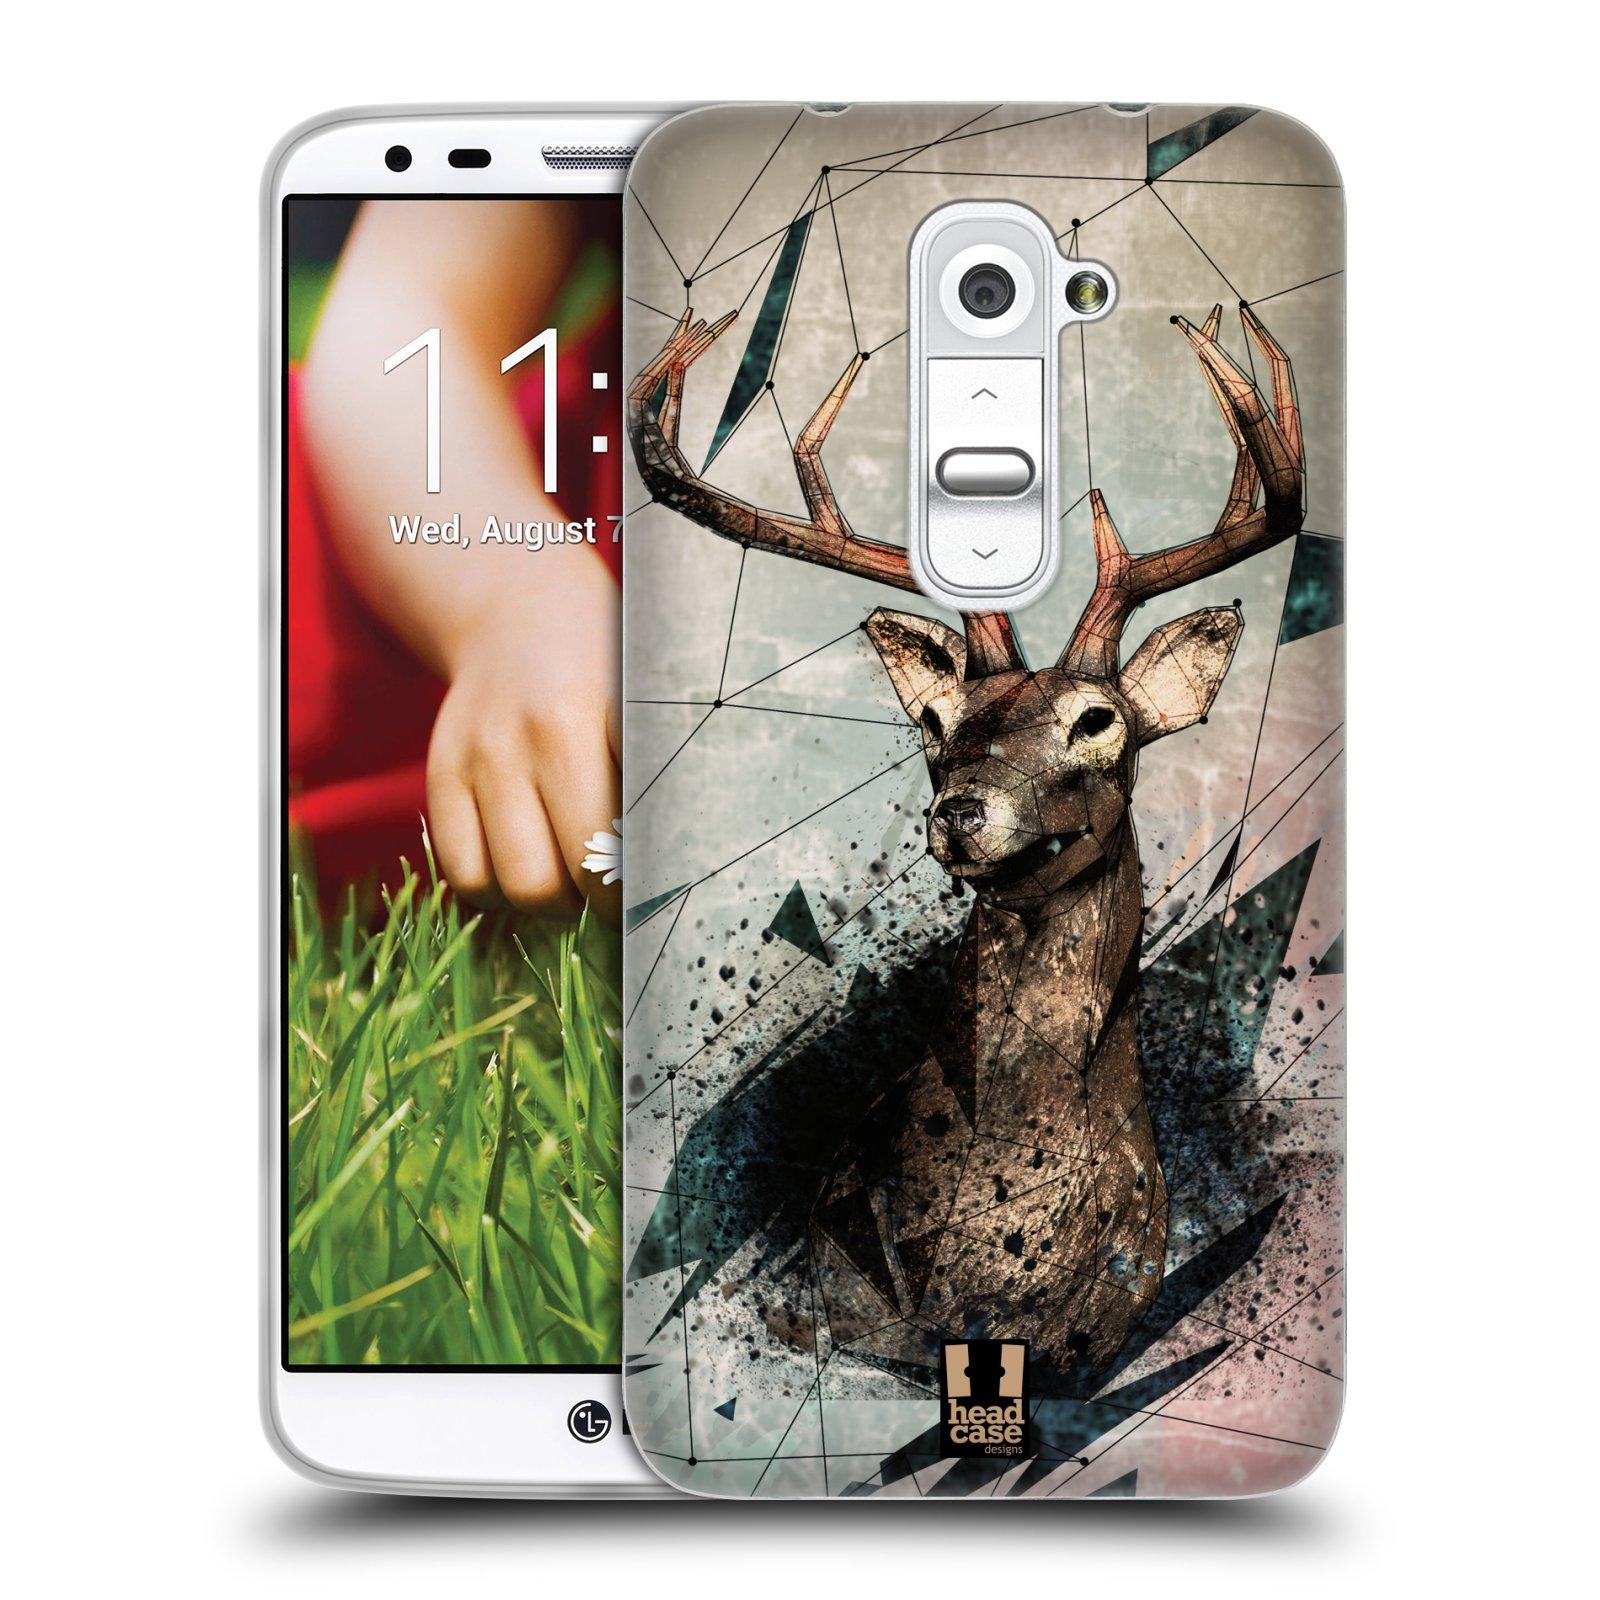 HEAD CASE silikonový obal na mobil LG G2 vzor Skica zvíře kreslené jelen